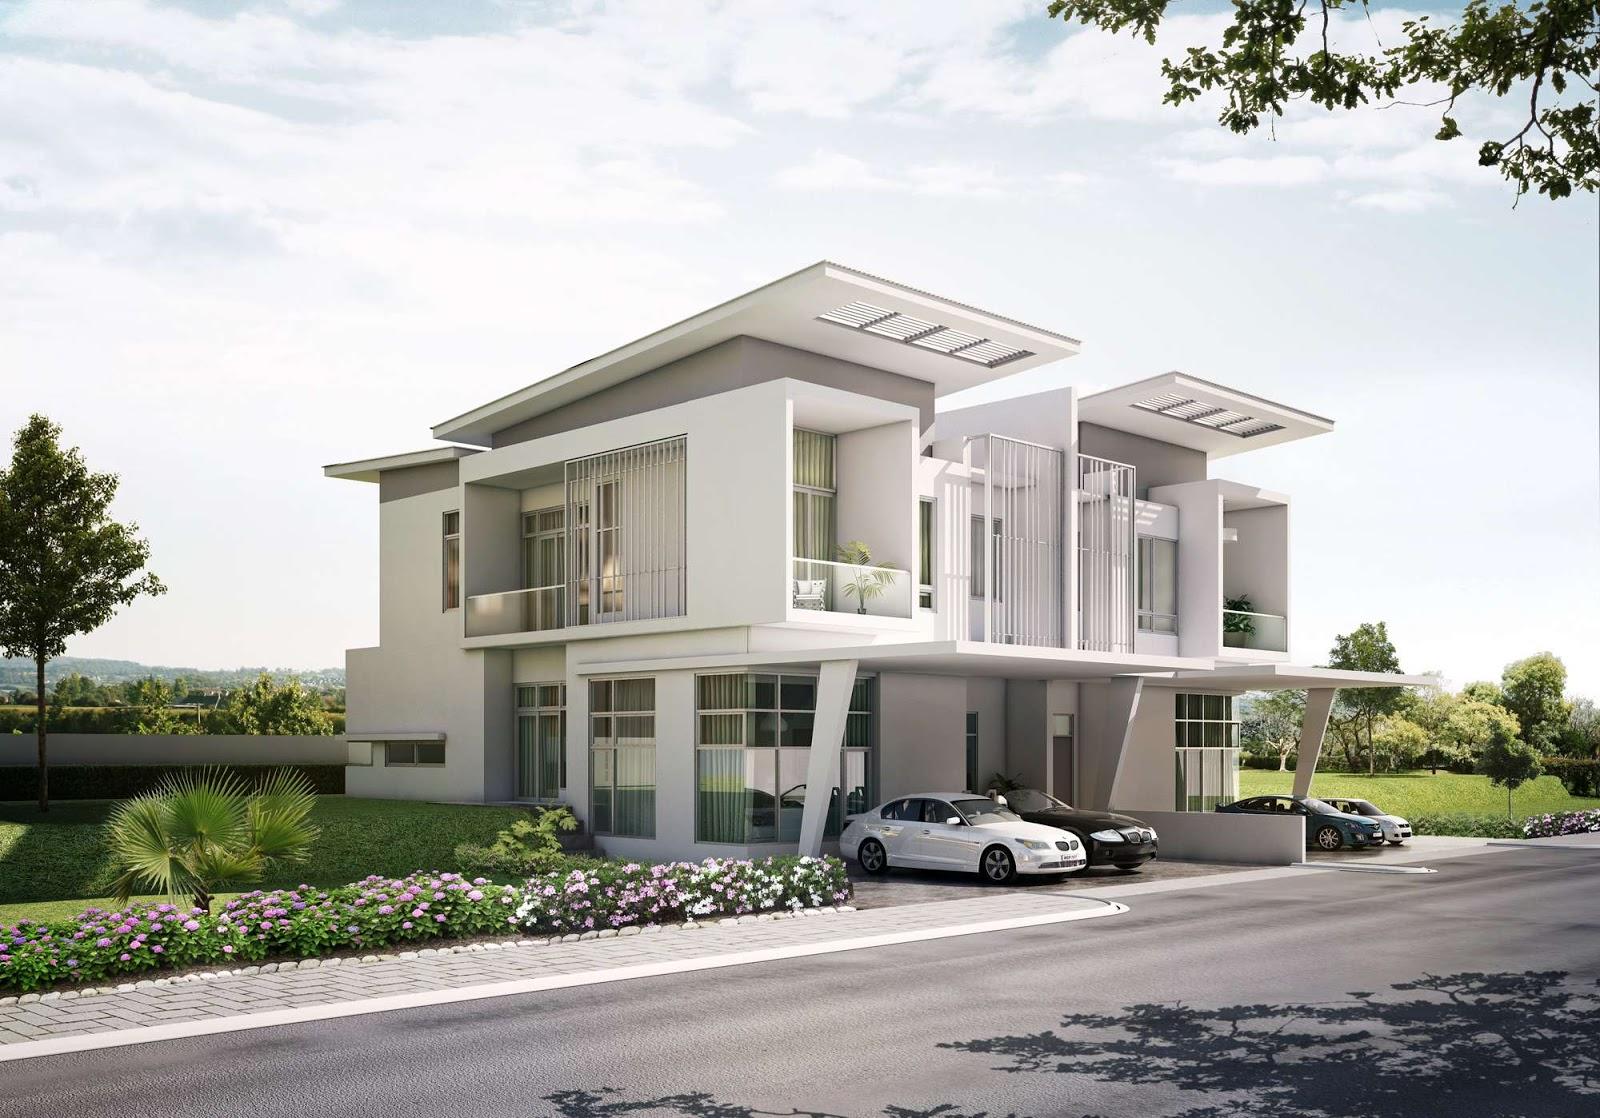 New home designs latest.: Singapore modern homes exterior ...